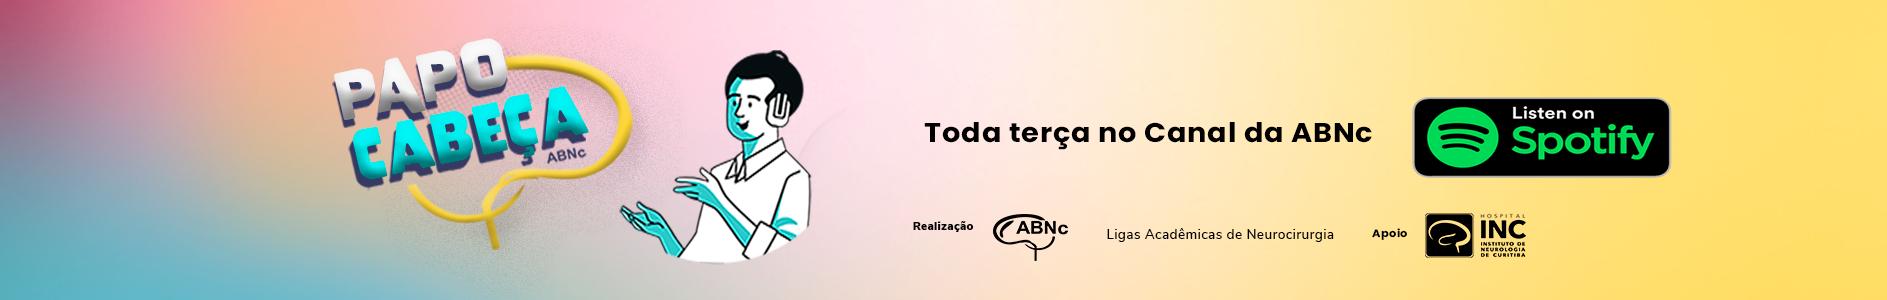 Papo Cabeça Spotify